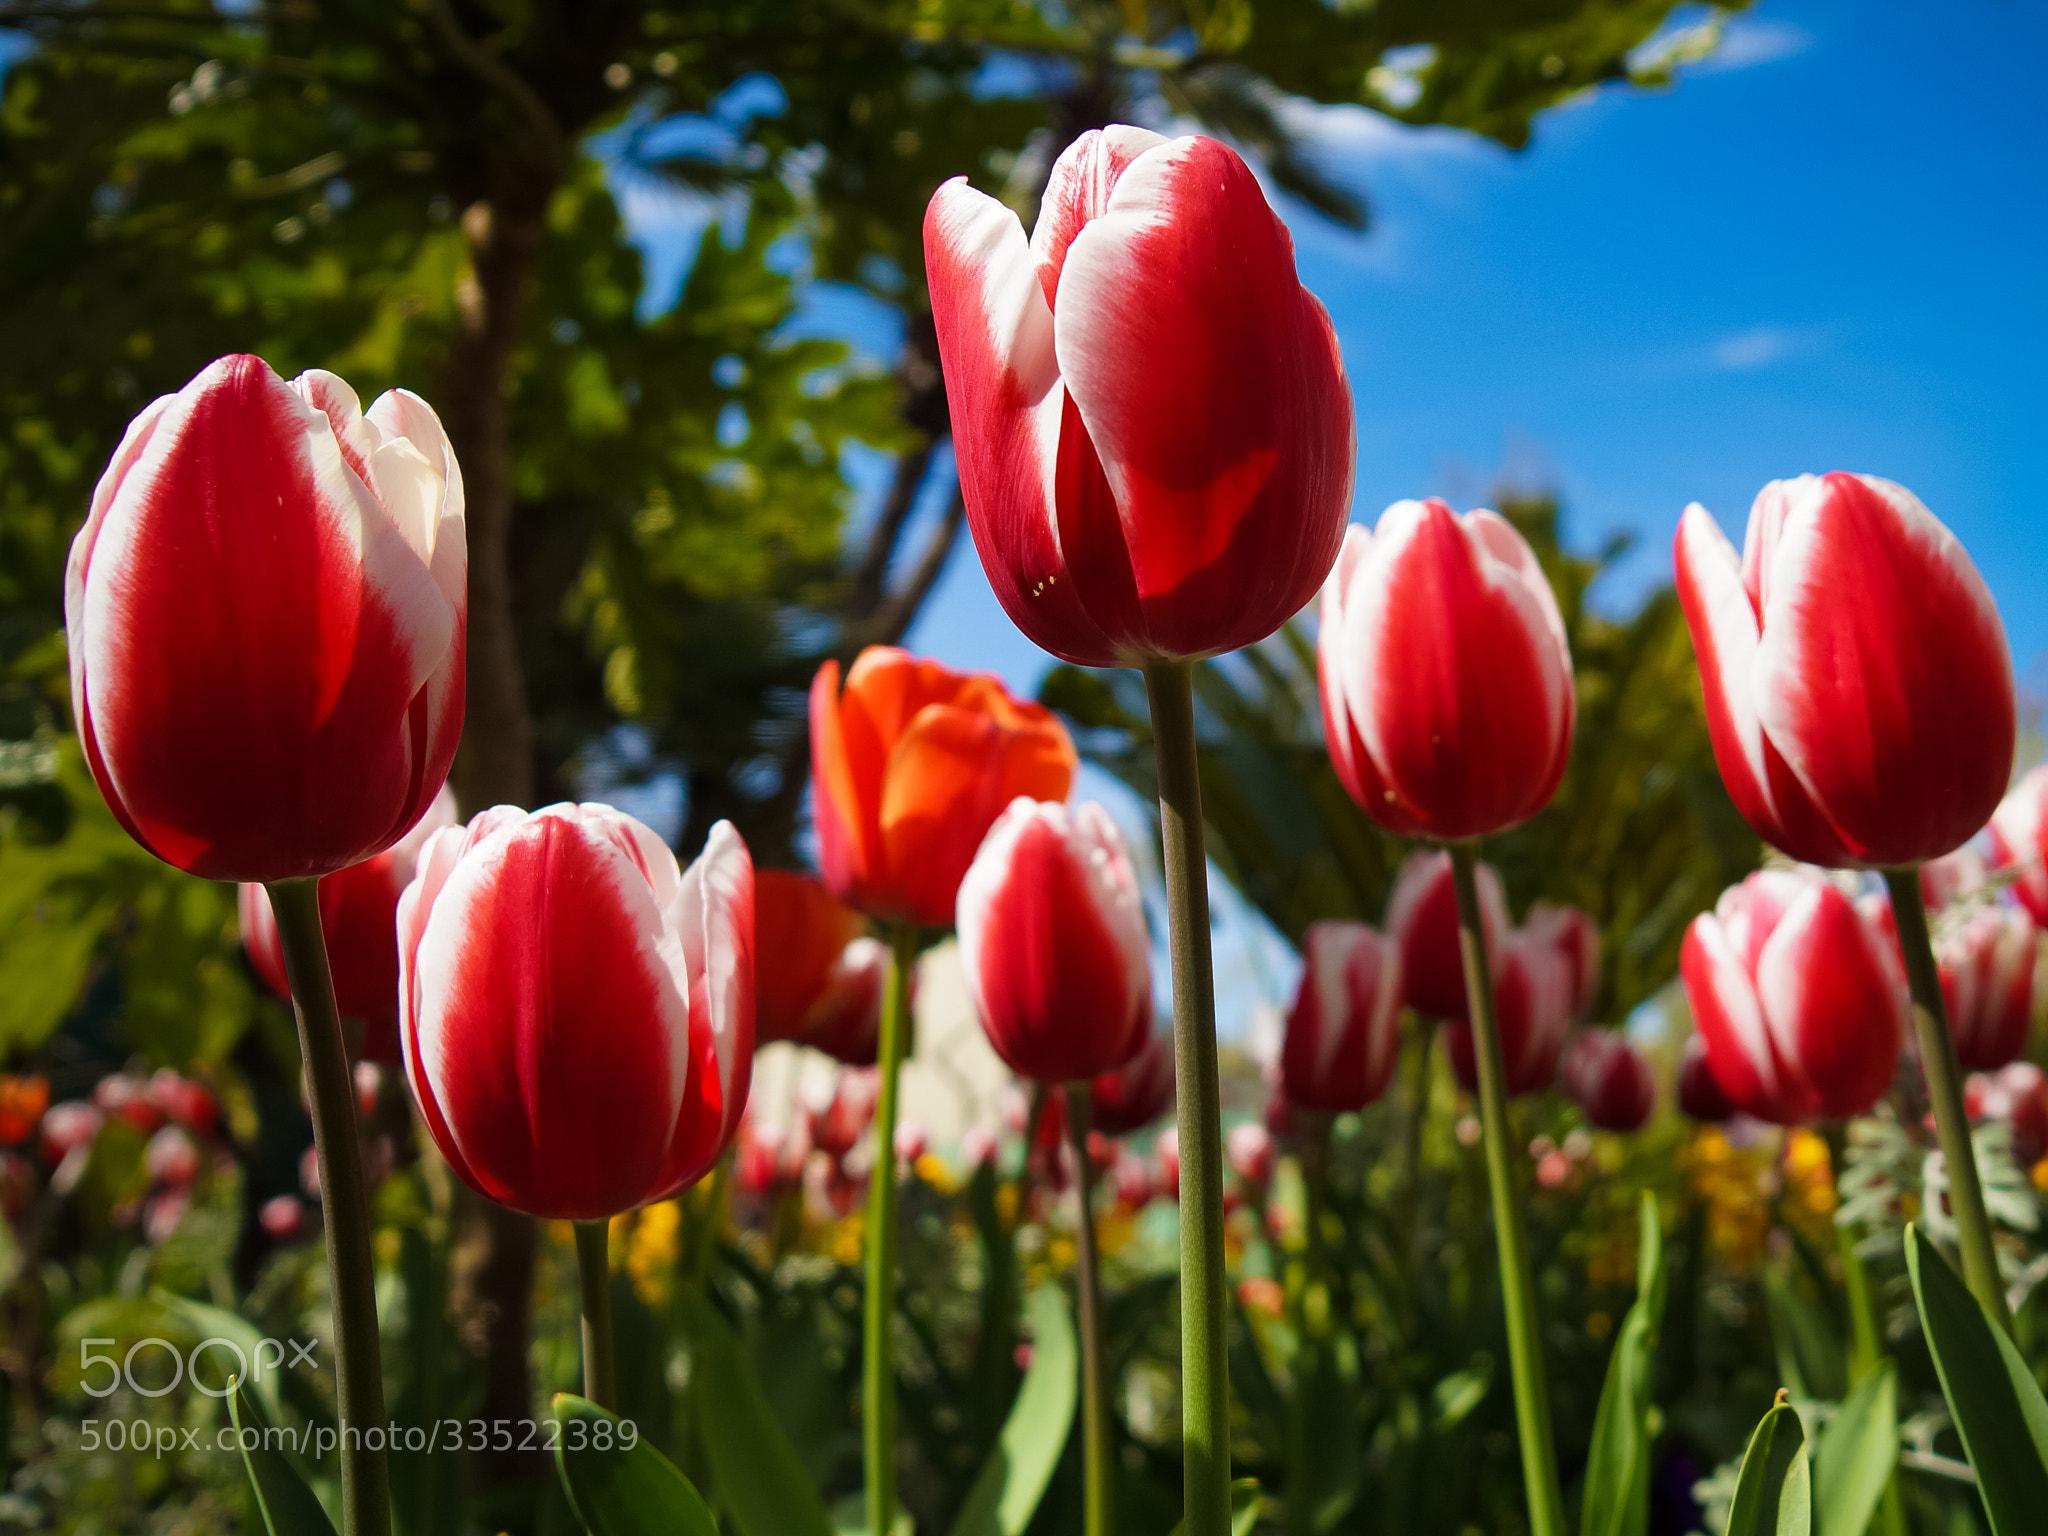 Photograph tulipes by Eric Vermeil on 500px